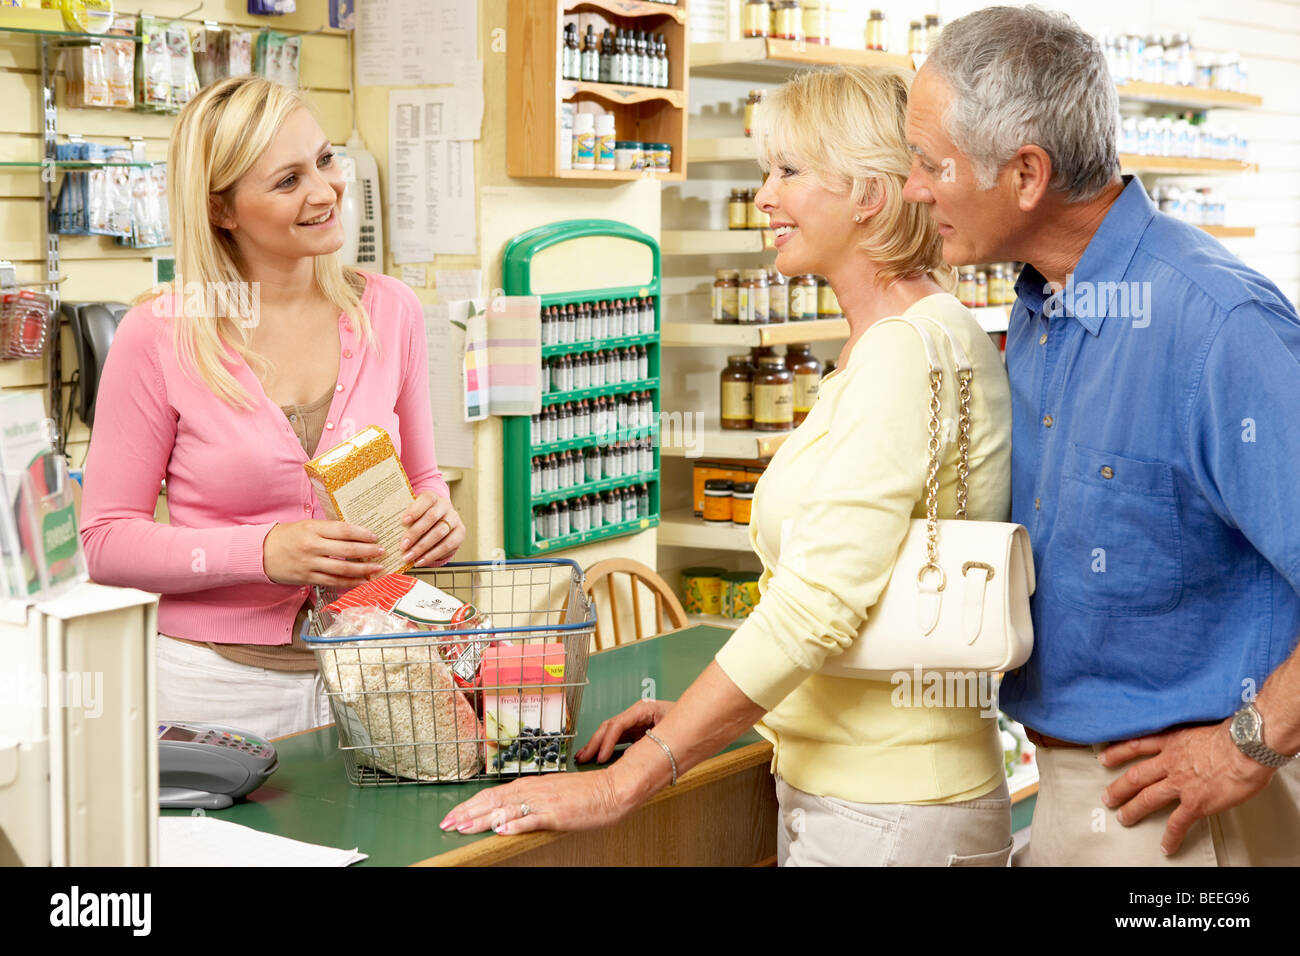 Health Food Store Resume